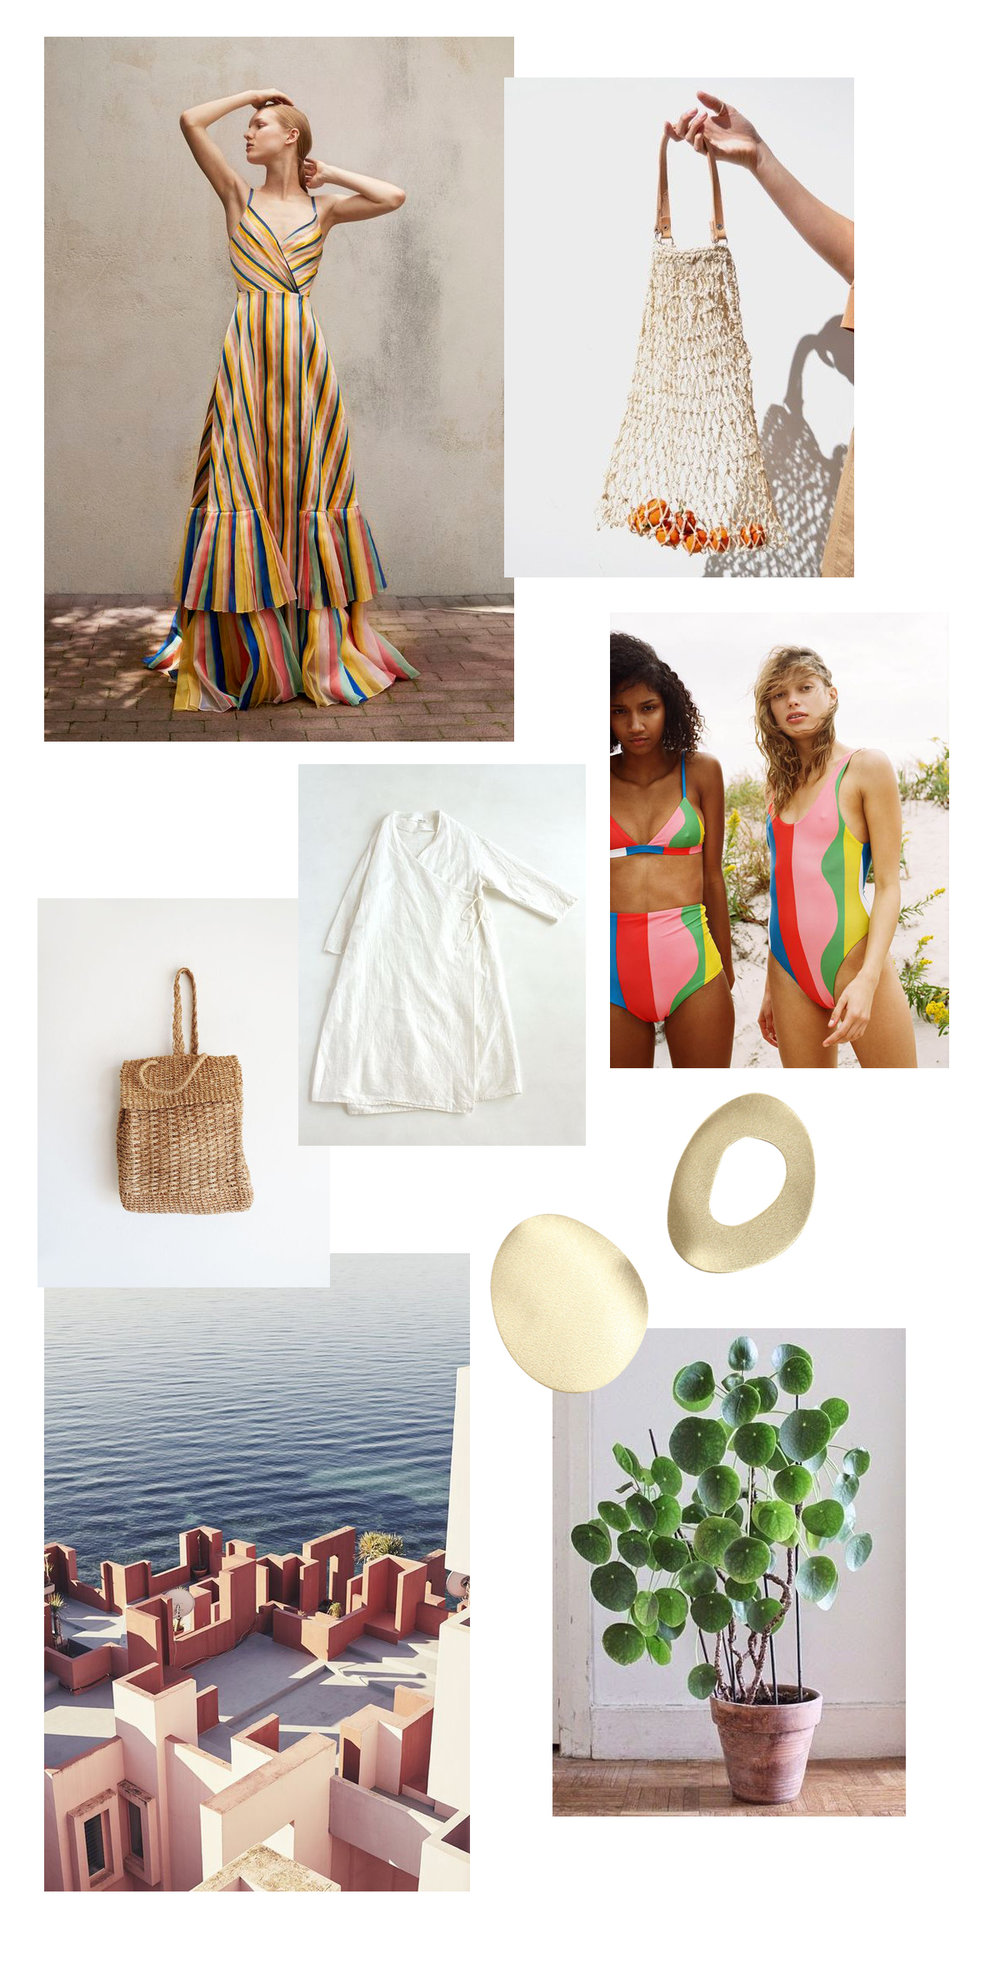 1 - Carolina Herrera, 2 - Dainty Fashion, 3 - Barnaby Jack, 4 - Evam Eva, 5 - Mara Hoffman, 6 - Vogue, 7 - Nila, 8 - Littlegrennshed